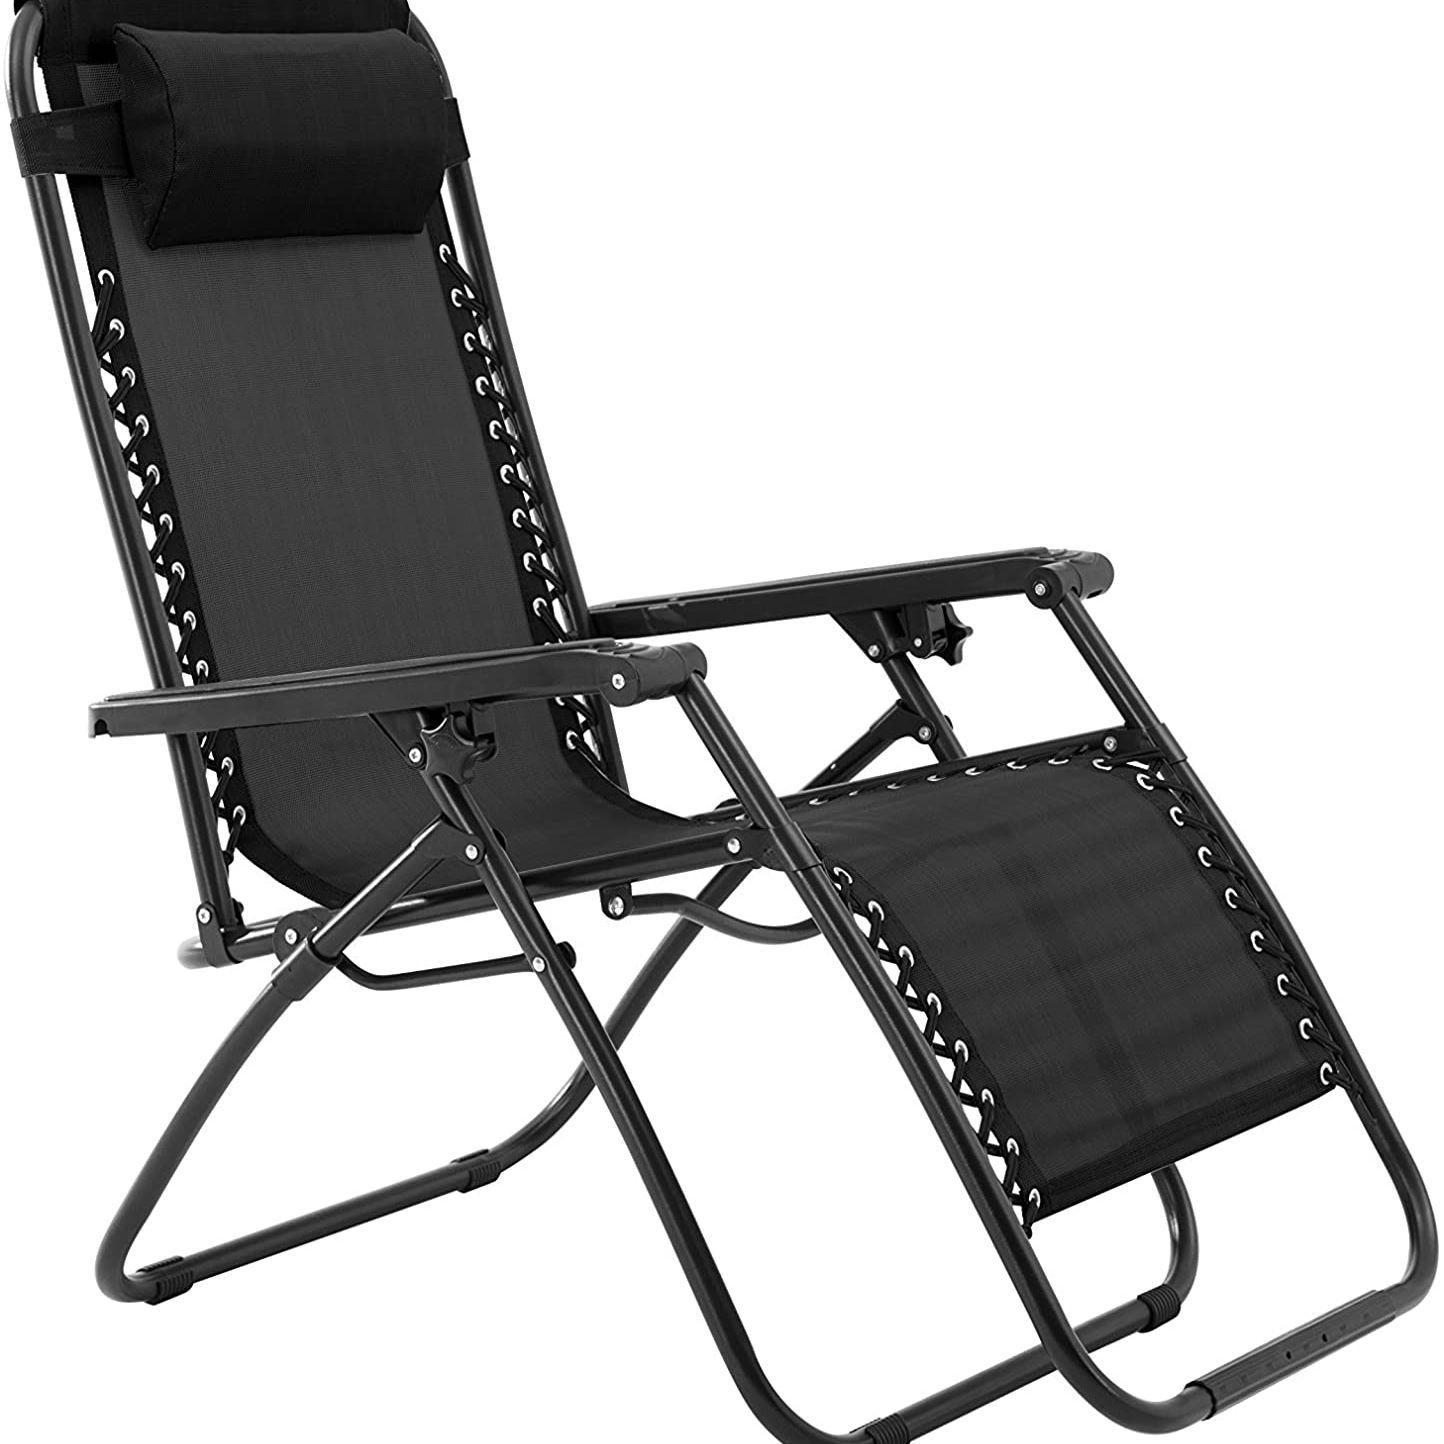 The 8 Best Zero Gravity Chairs Of 2021